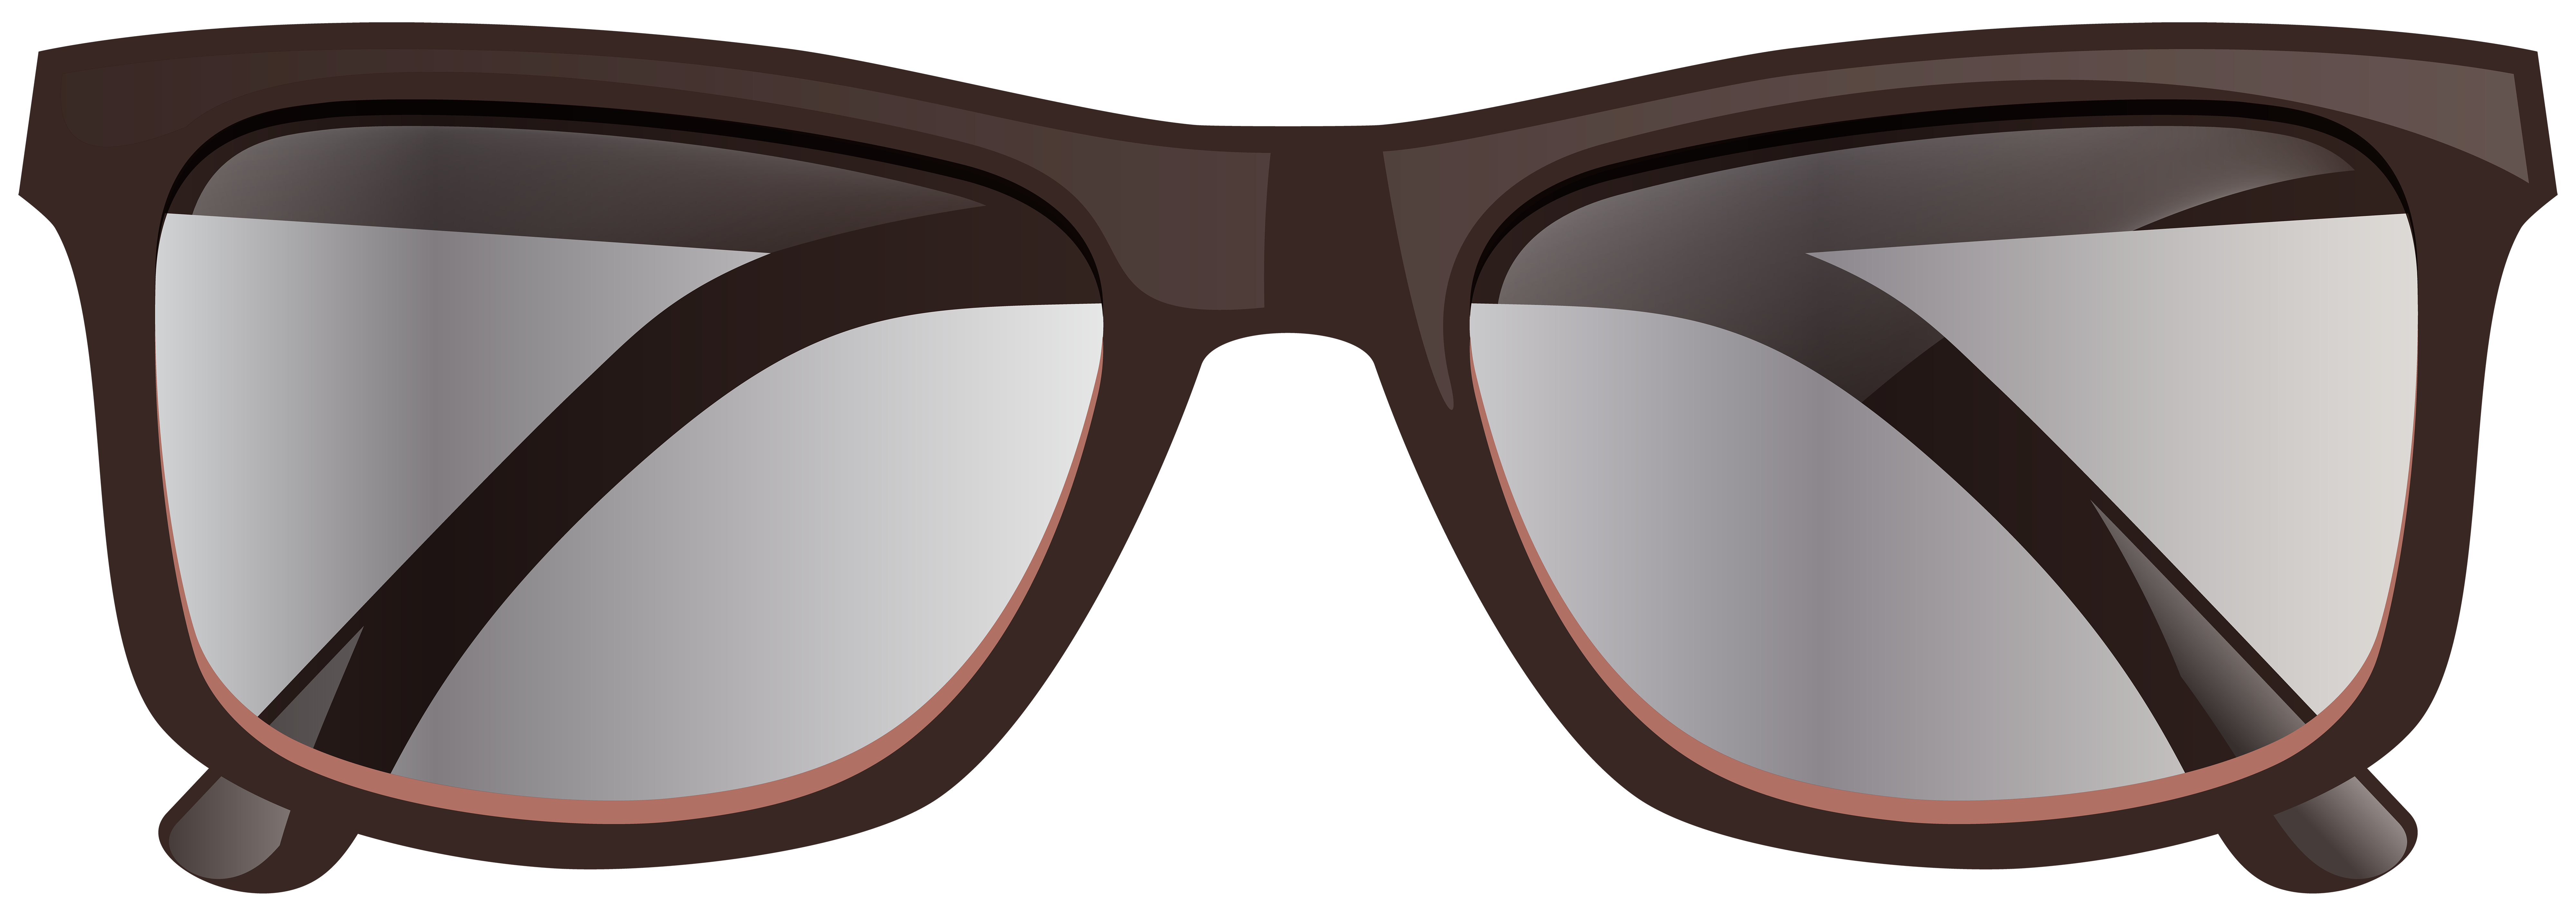 Glasses png clip art. Eyeglasses clipart brown glass